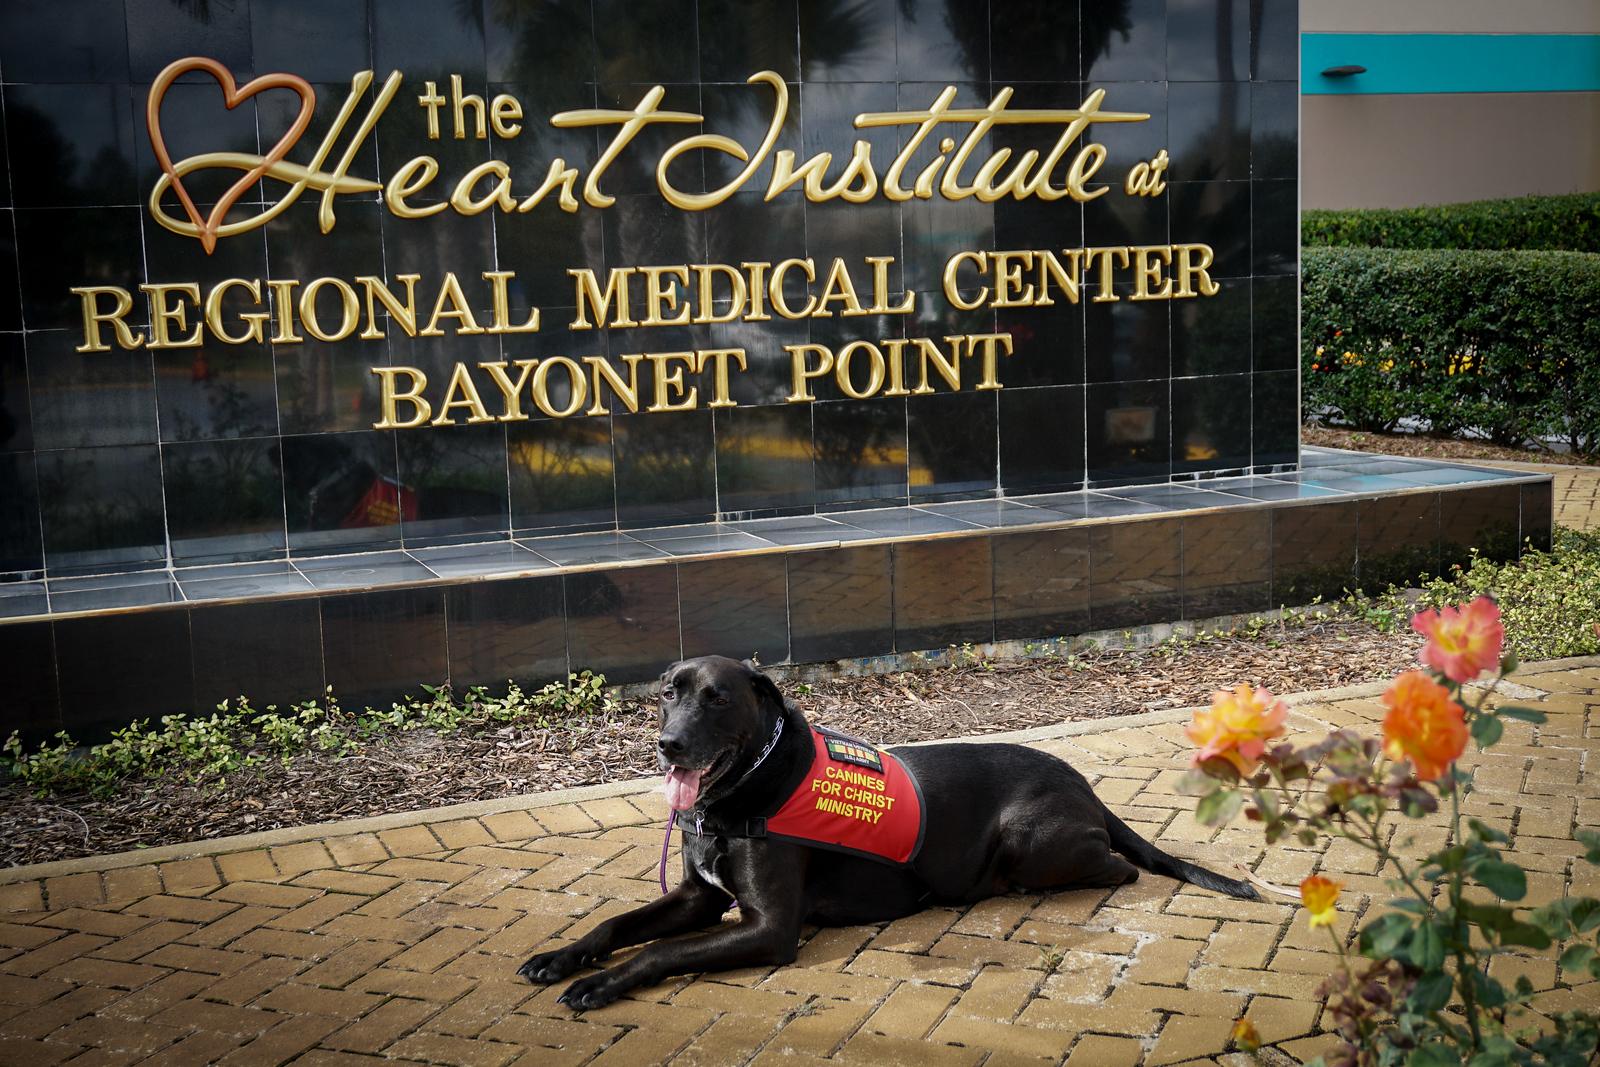 DrLight at Bayonet Point Medical Center. 11 29  2016, 04007